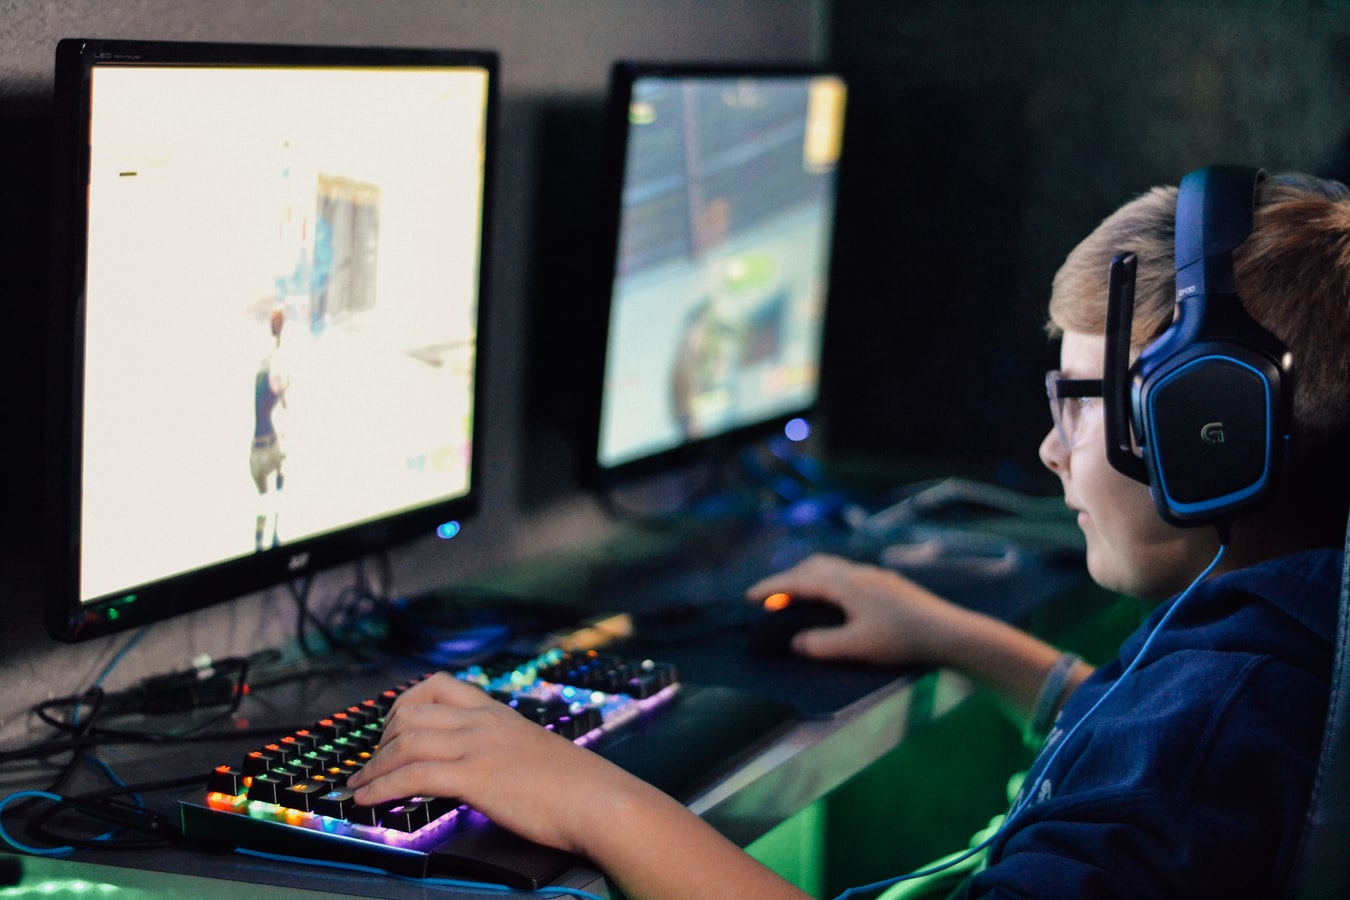 Fortnite: Πώς θα απεξαρτηθεί το παιδί από το παιχνίδι-εθισμό